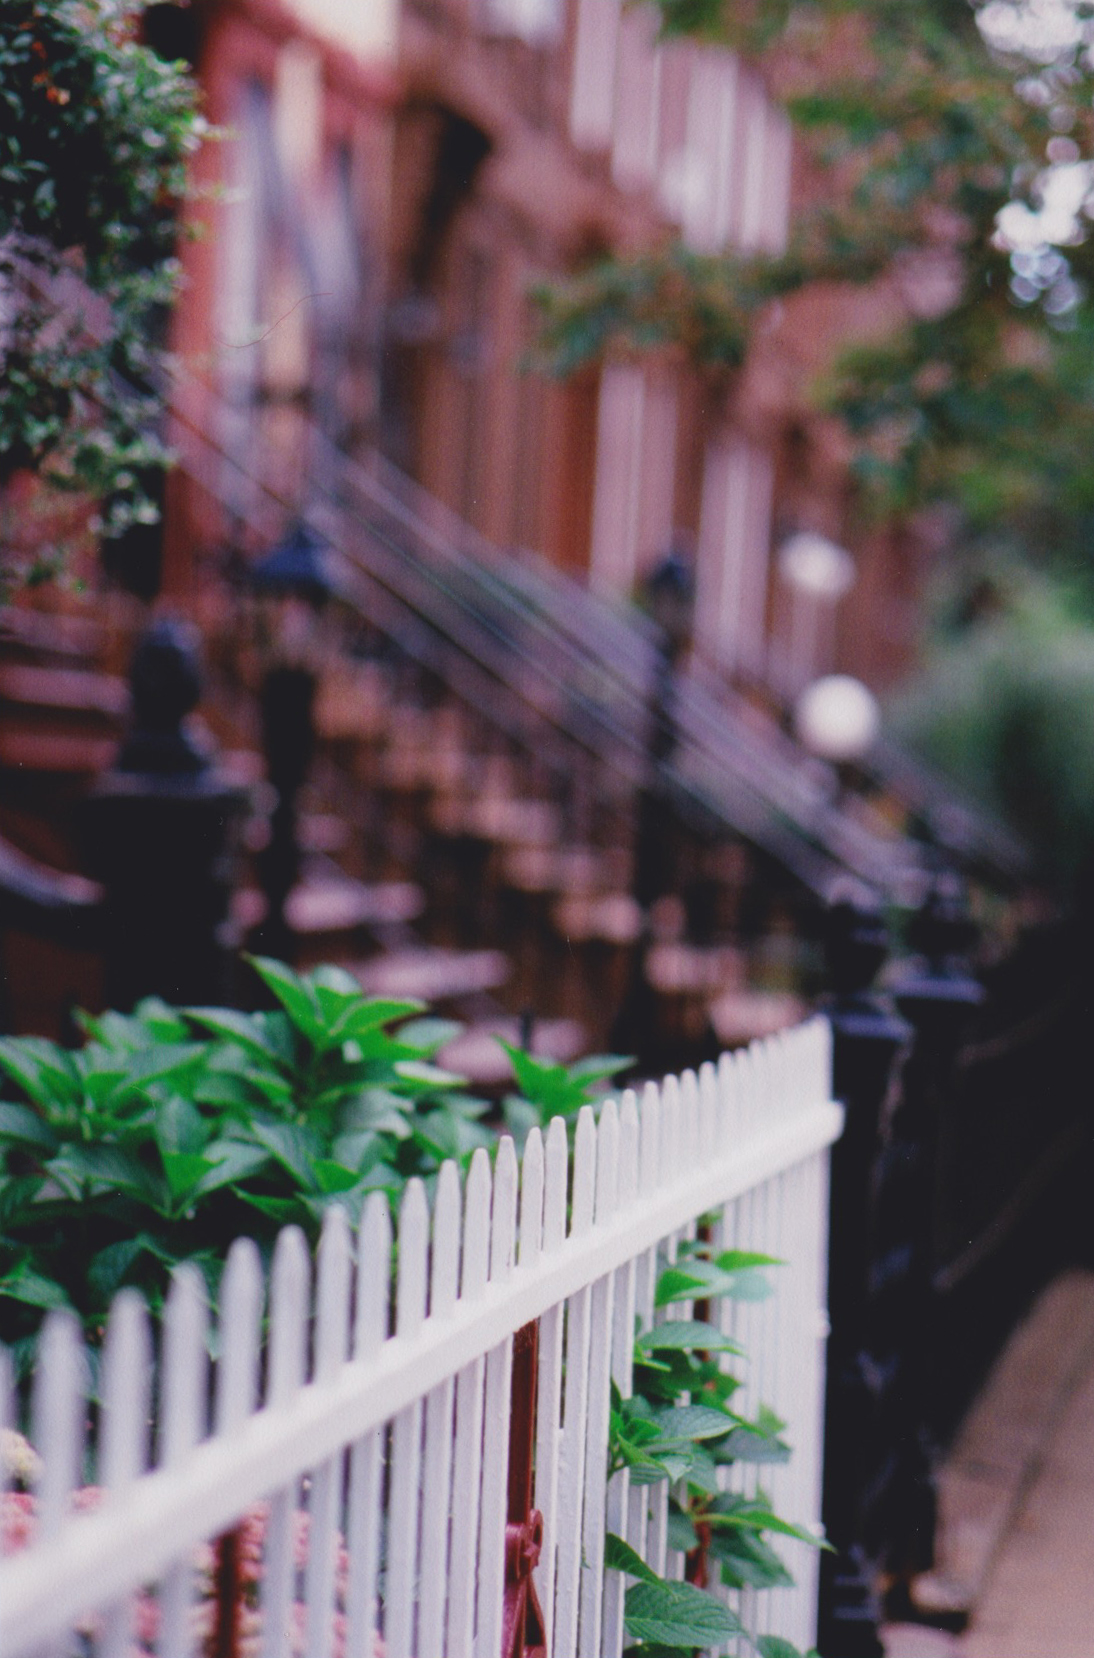 brooklyn_analogue.jpg